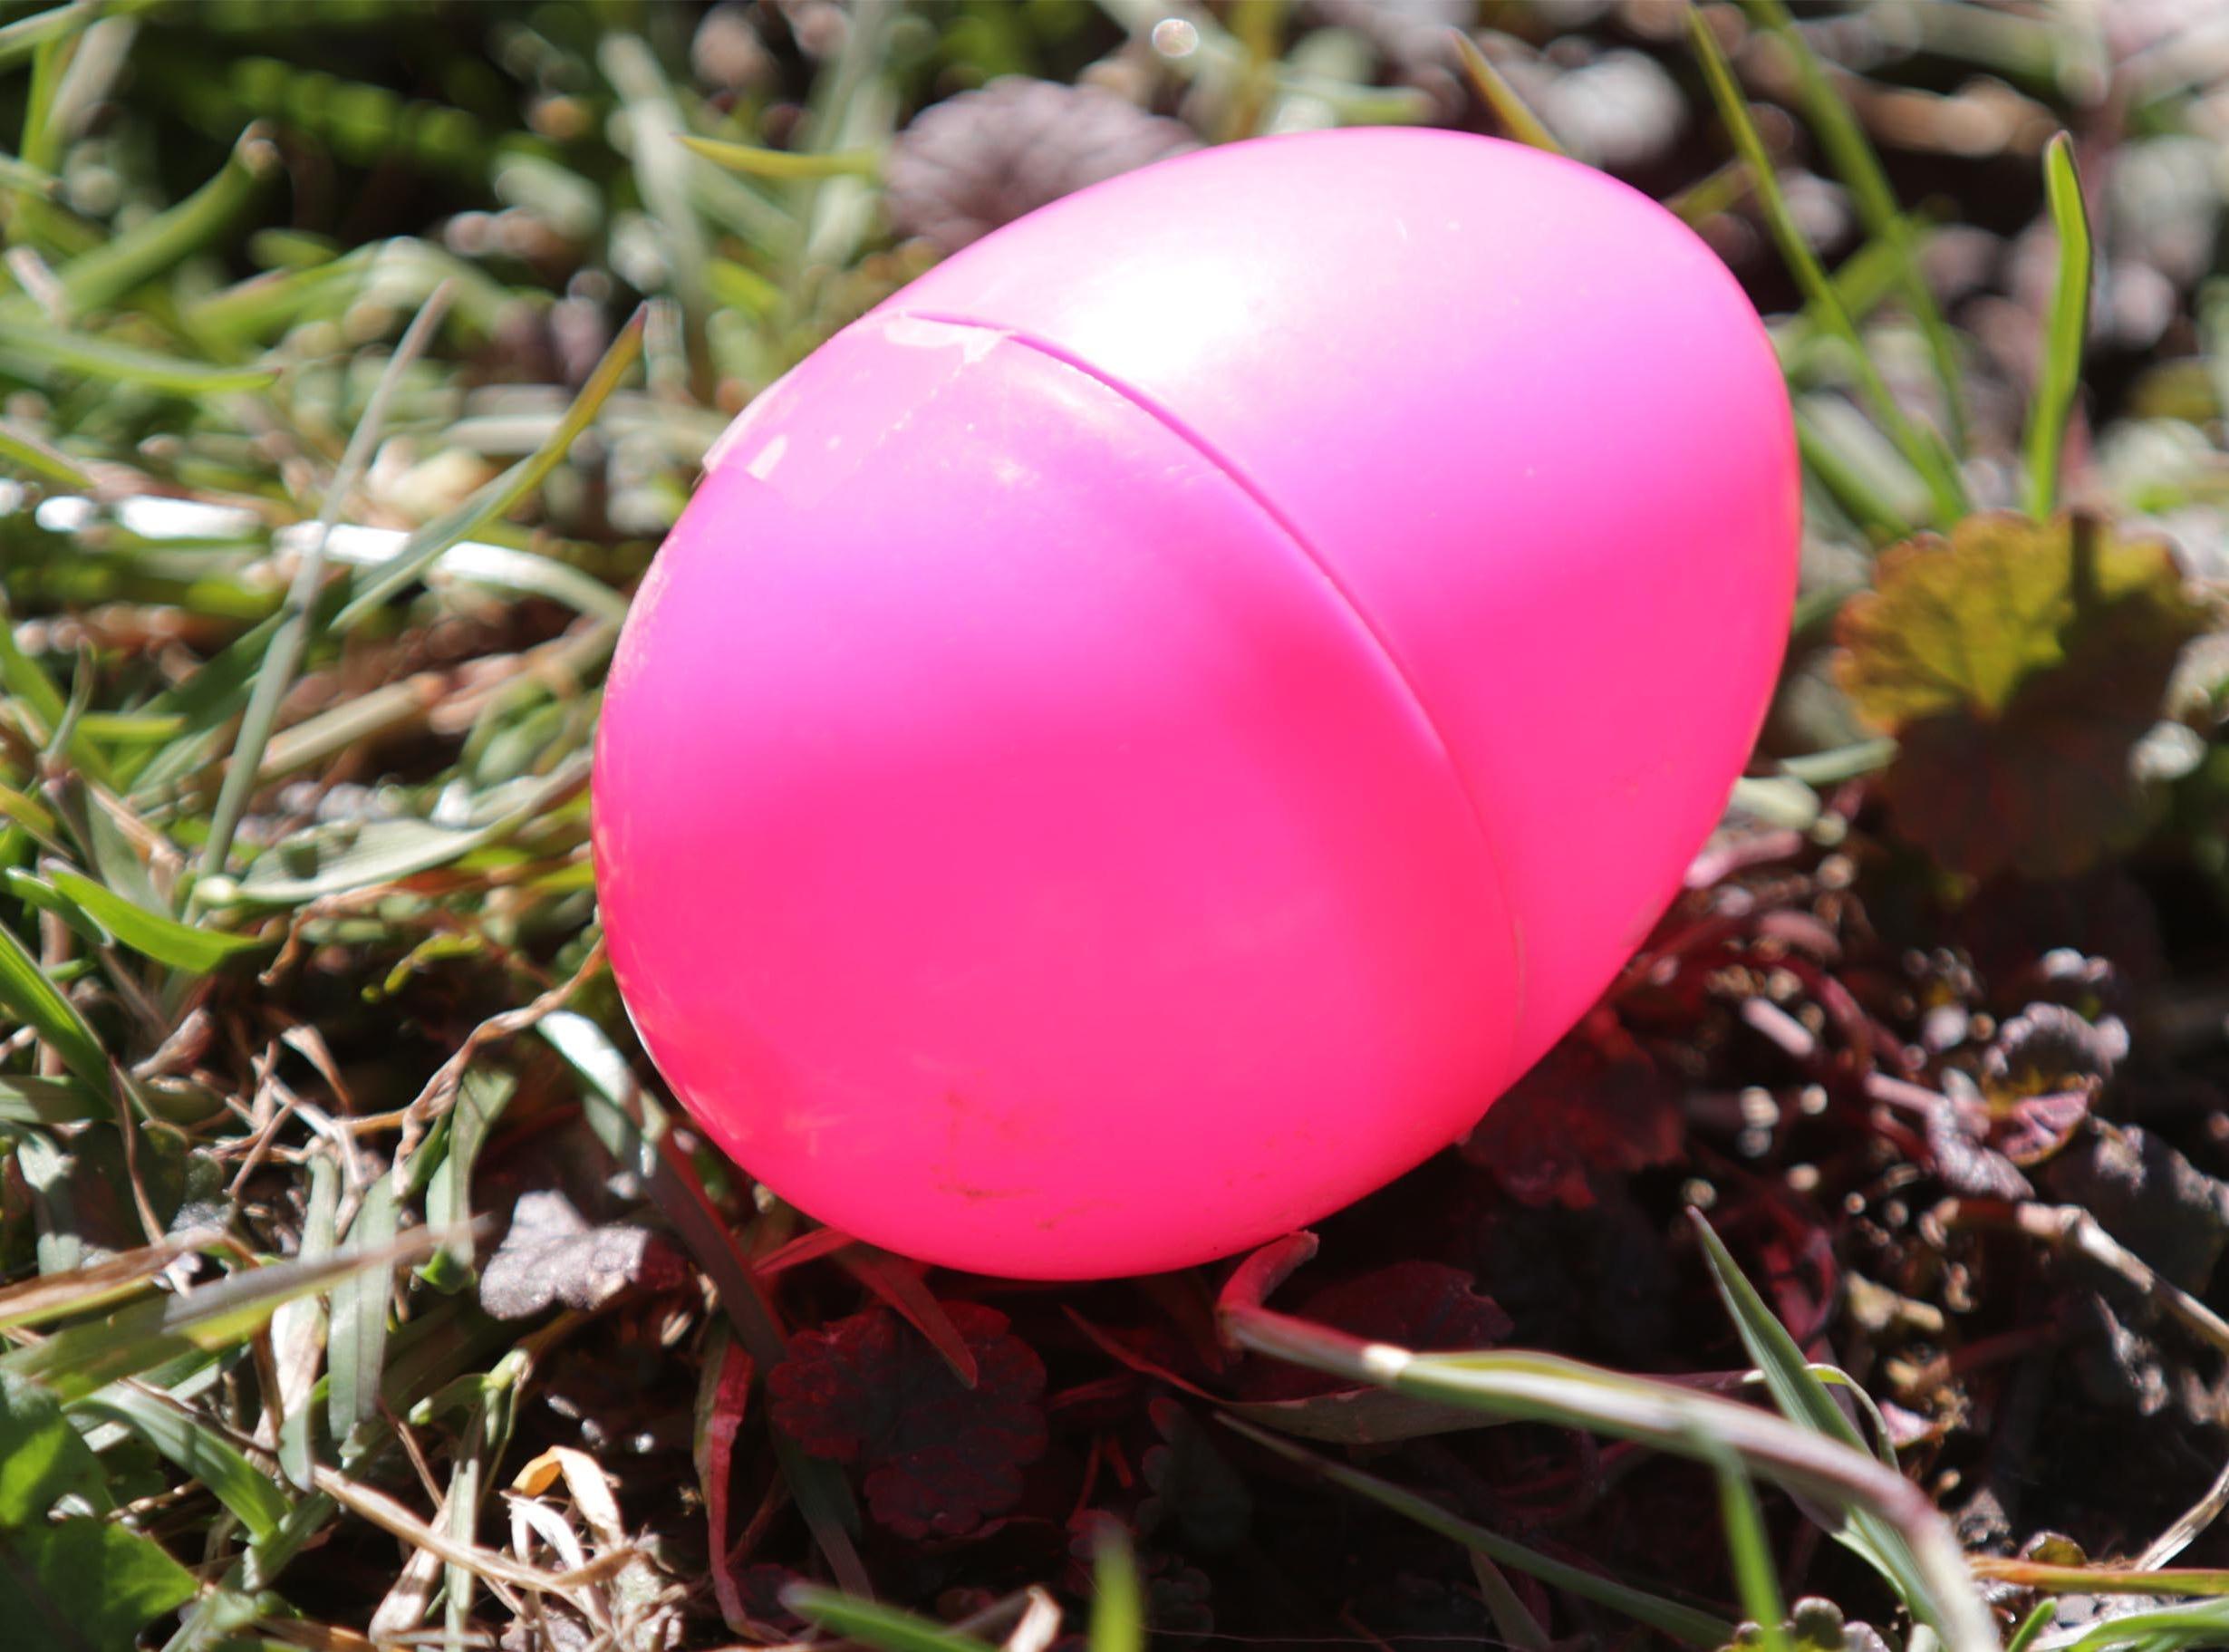 An easter egg before the Hocevar Easter Egg Hunt, Saturday, April 20, 2019, in Sheboygan Falls, Wis.  This years marks 25 years for the Hocevar Family holding an Easter egg hunt at their home, according to Kathy Hocevar.